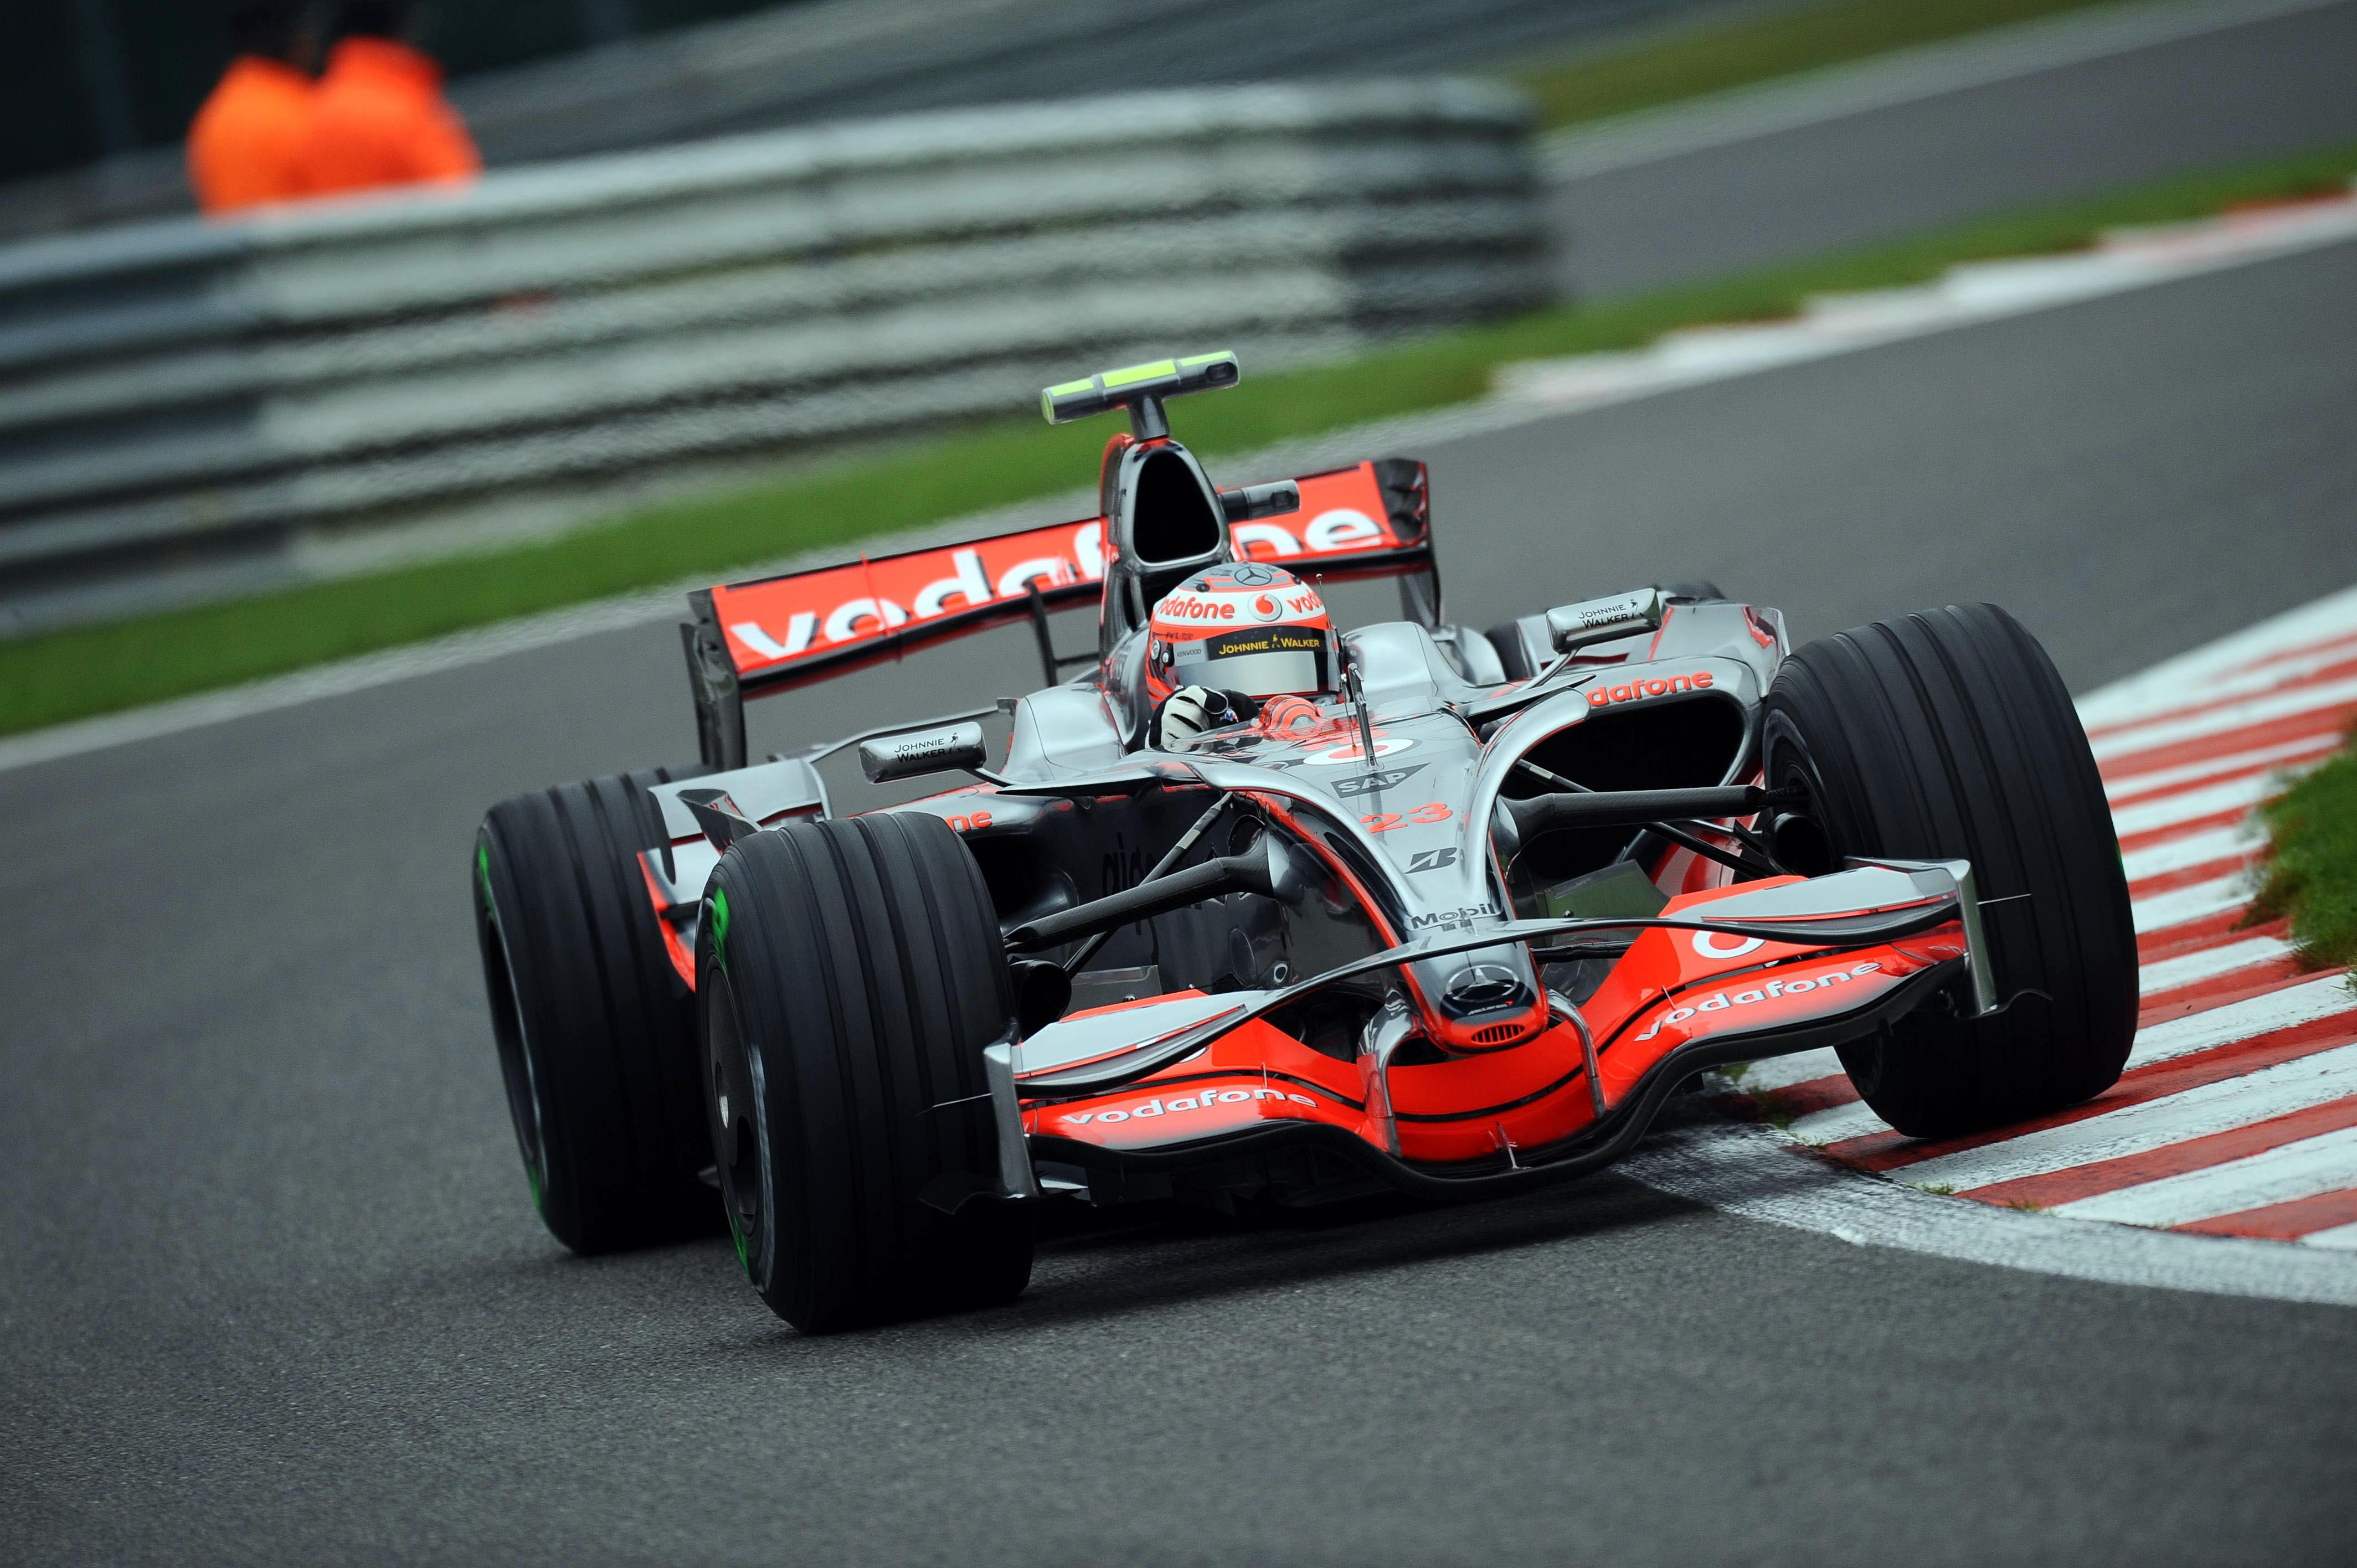 Formula 1 HD Wallpaper Mercedes - WallpaperSafari